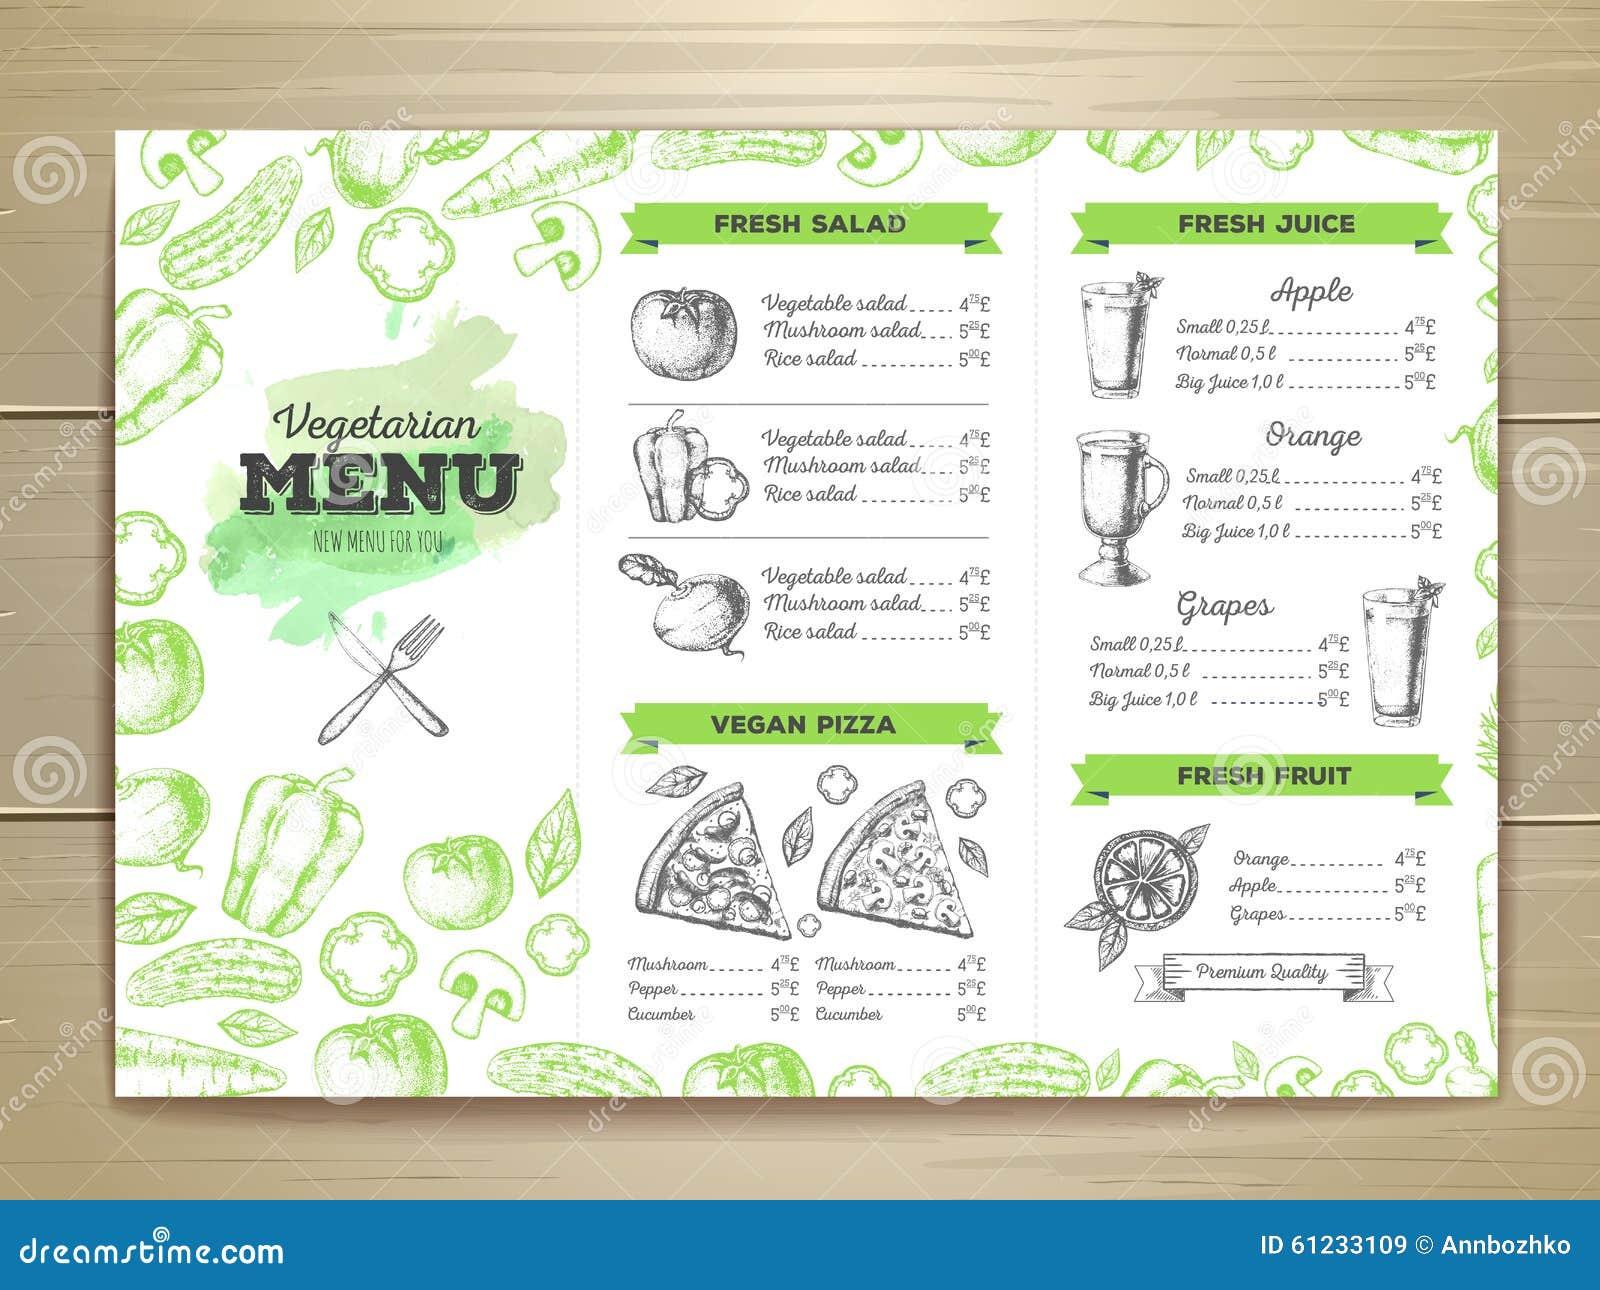 Vintage Vegetarian Food Menu Design. Stock Vector - Image: 61233109